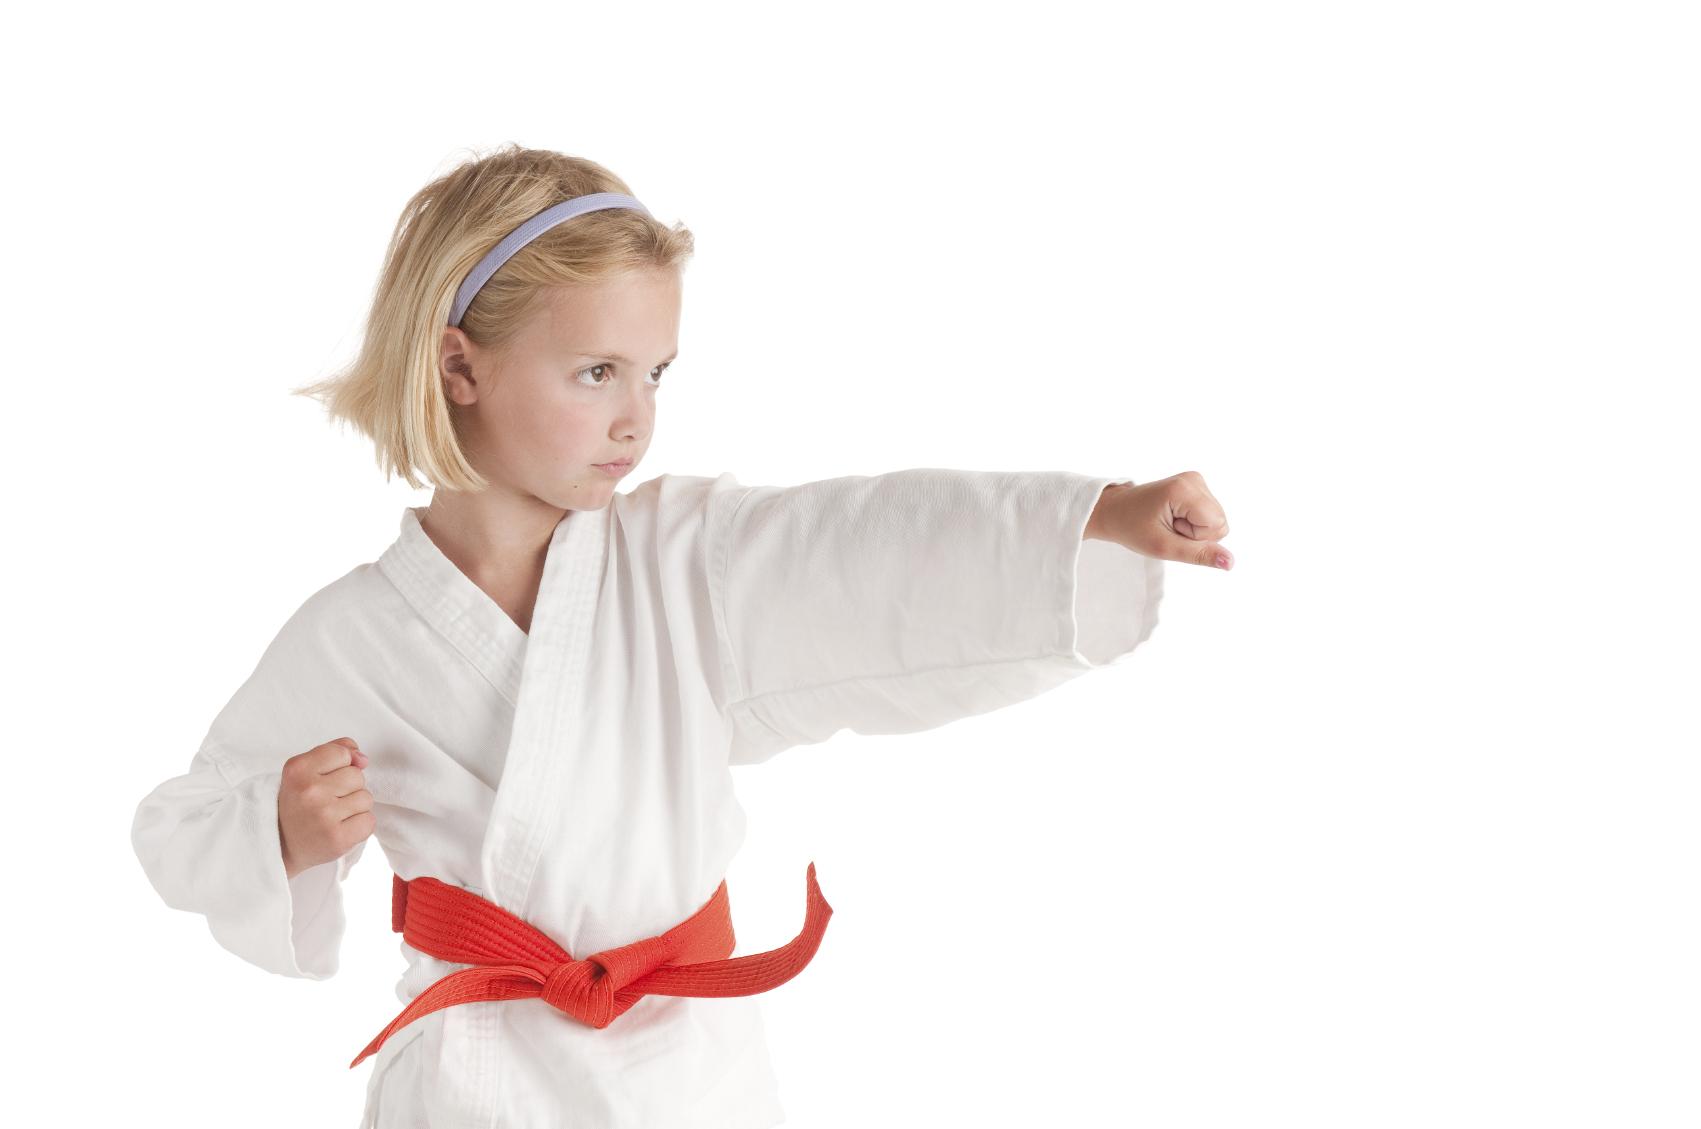 Martial Arts Program at Park's Taekwondo USA, |*City Name*|